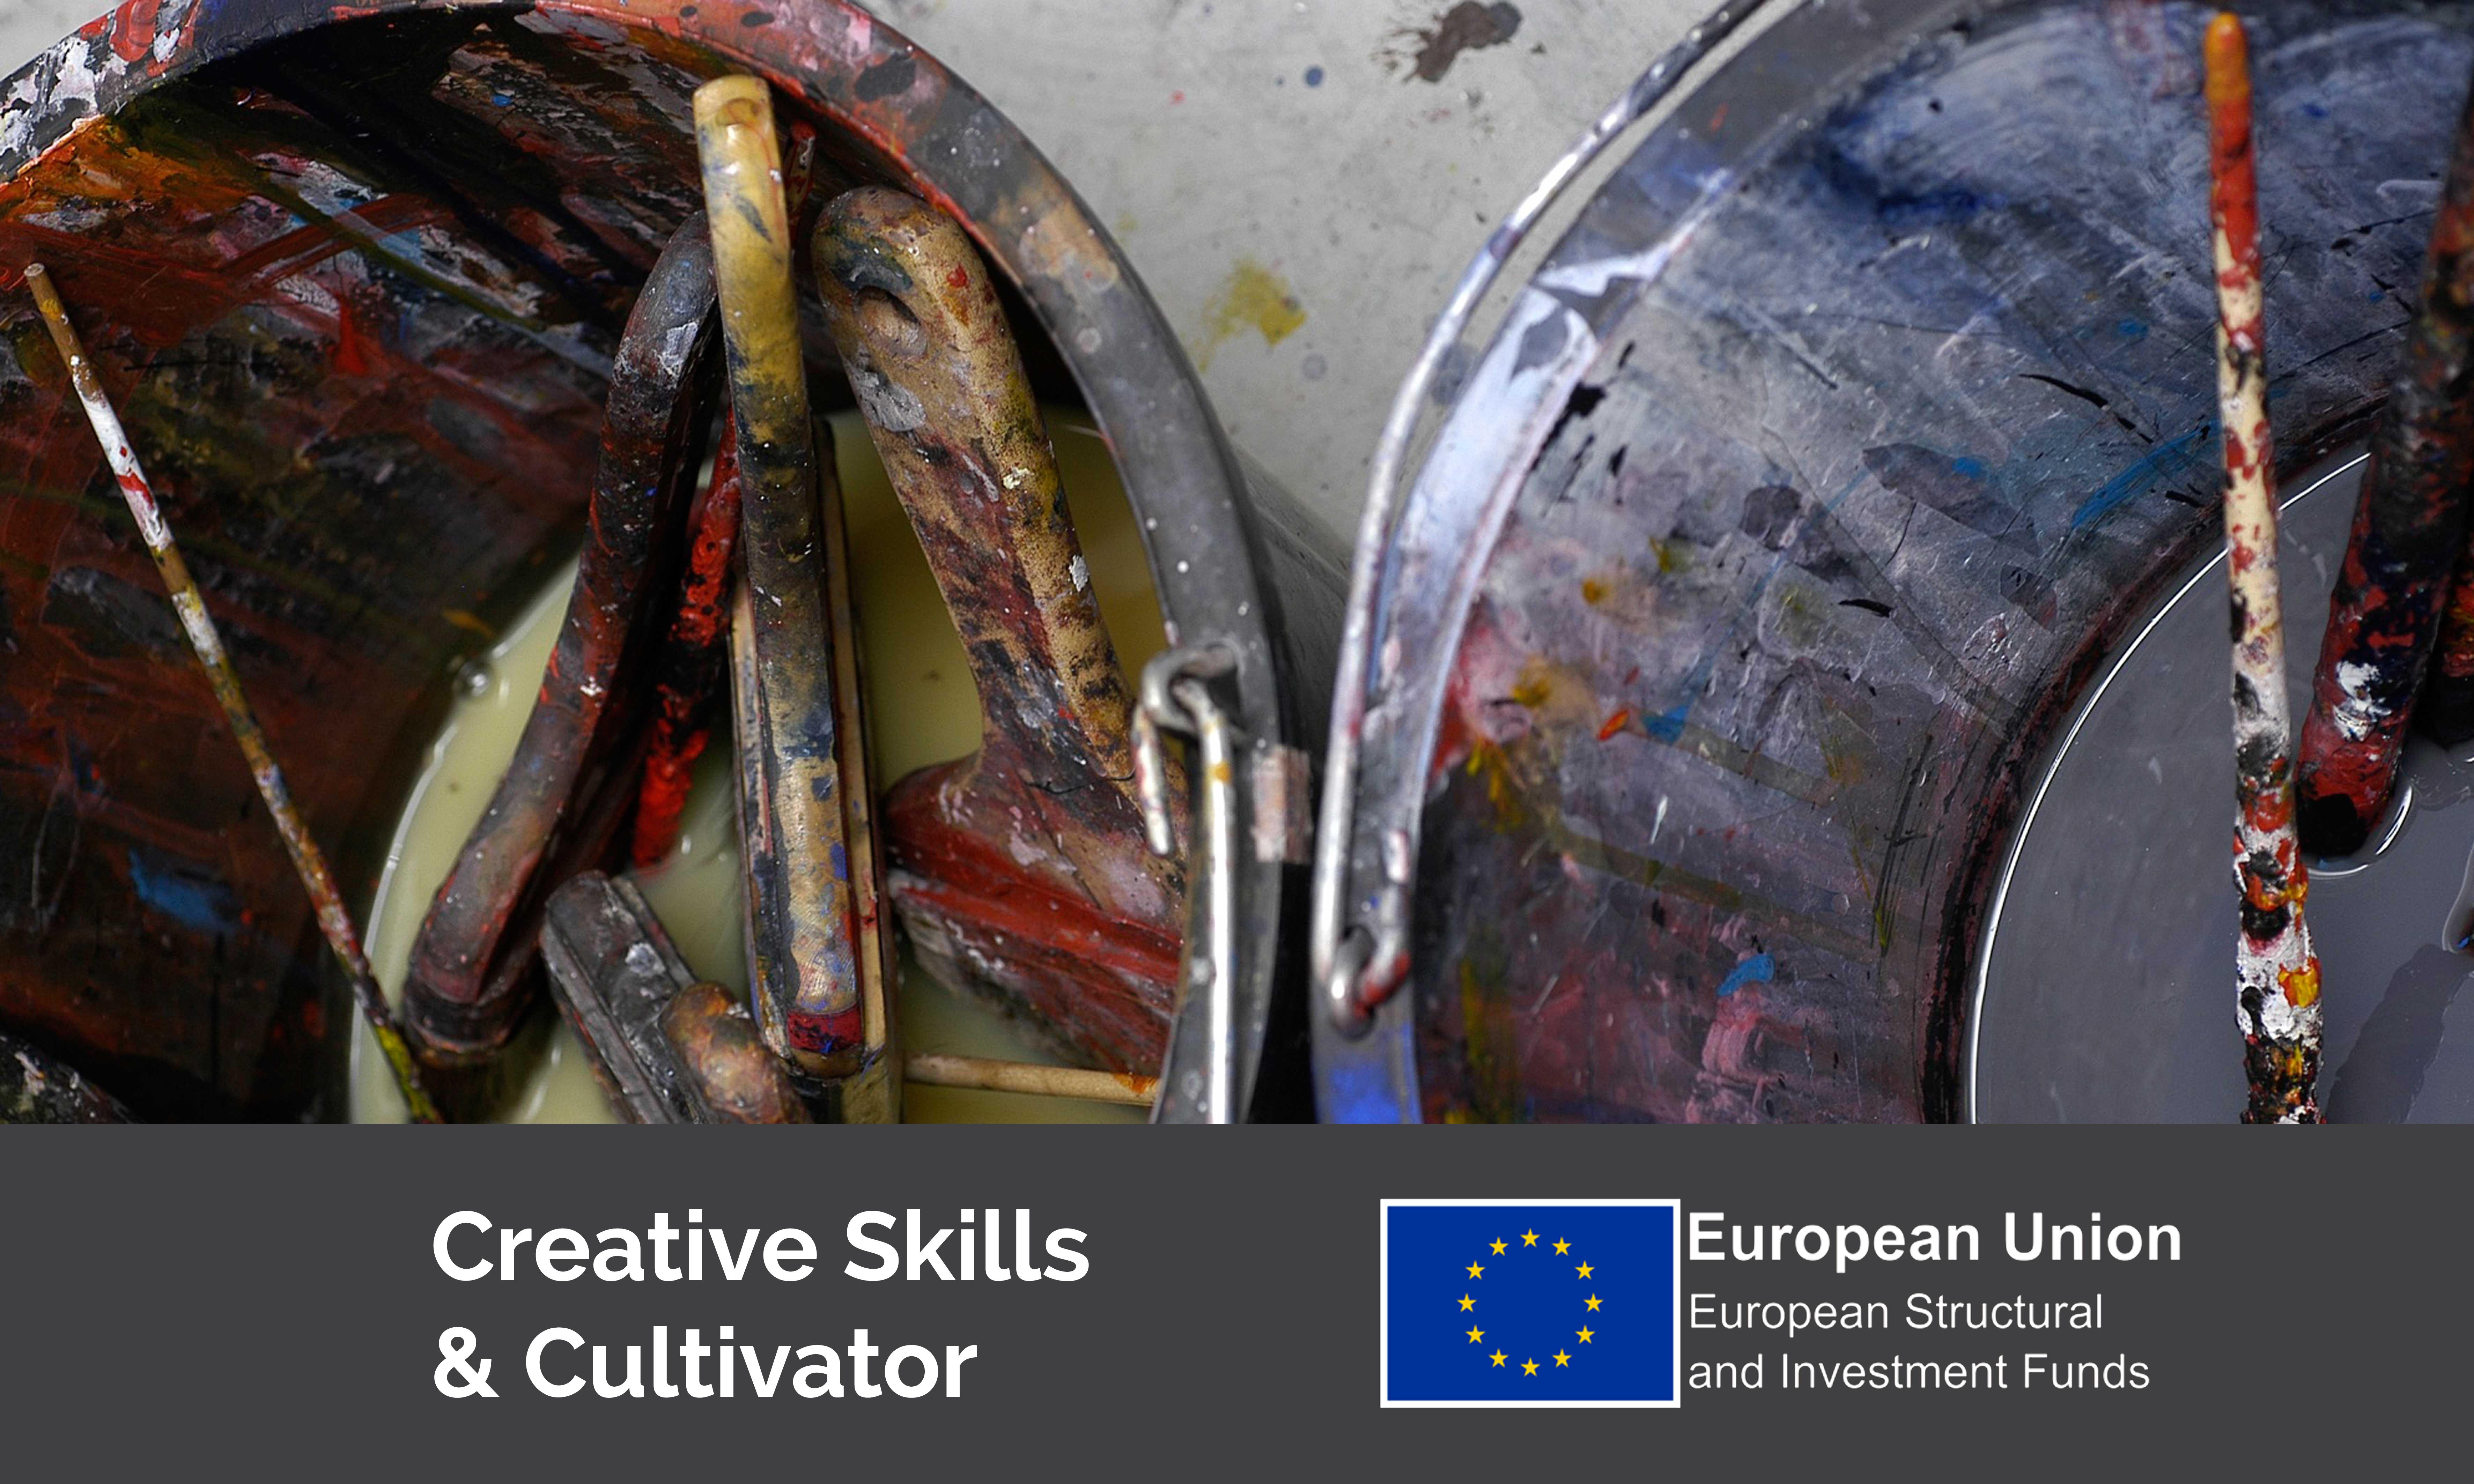 creative-skills-hero1-with-logo